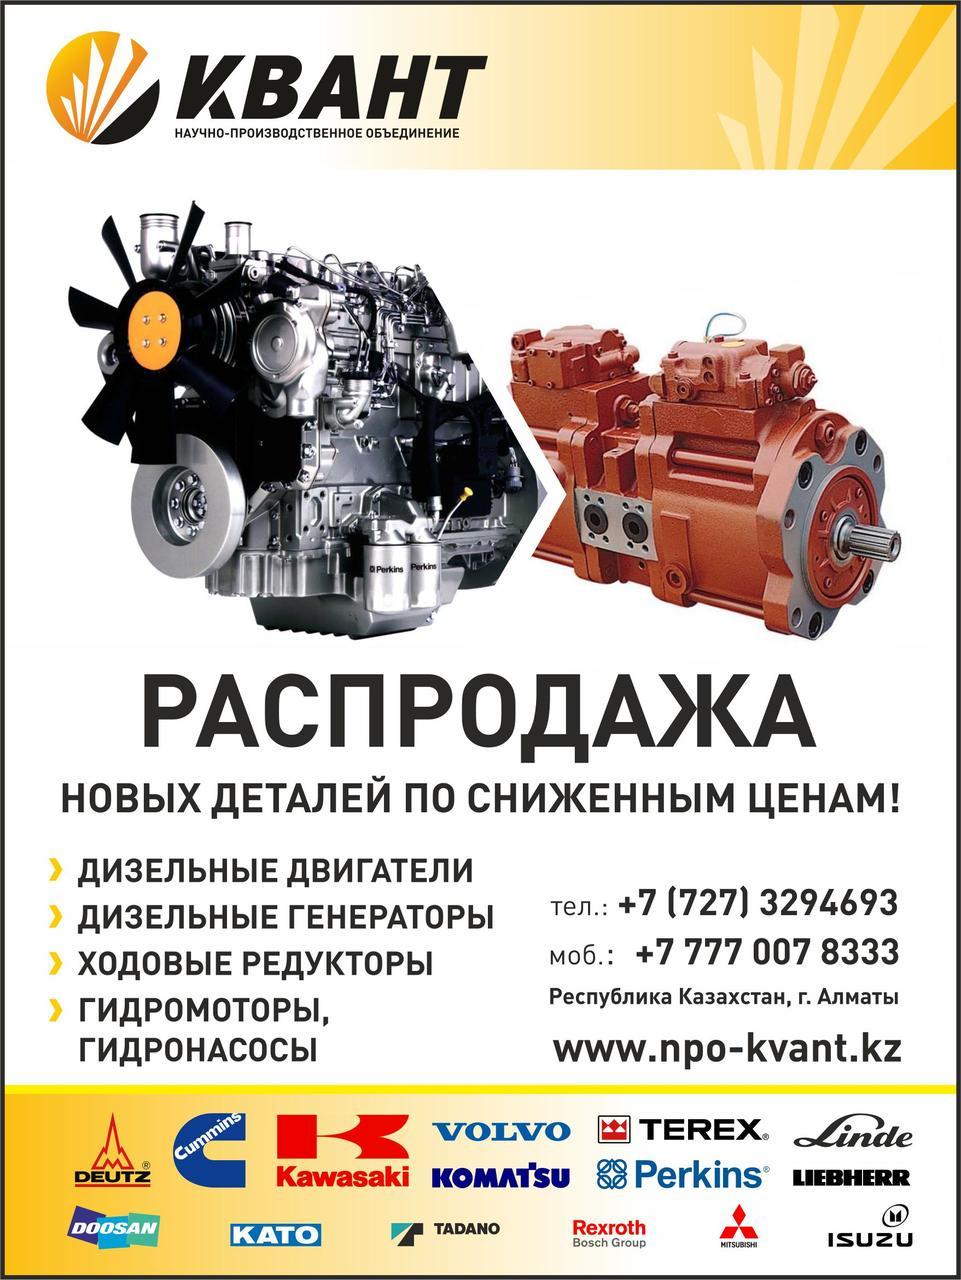 Двигатель Deutz TBRHS 518V16, Deutz TRHS518V16, Deutz F12M716, Deutz BF12M716, Deutz F16M716, Deutz BF16M716